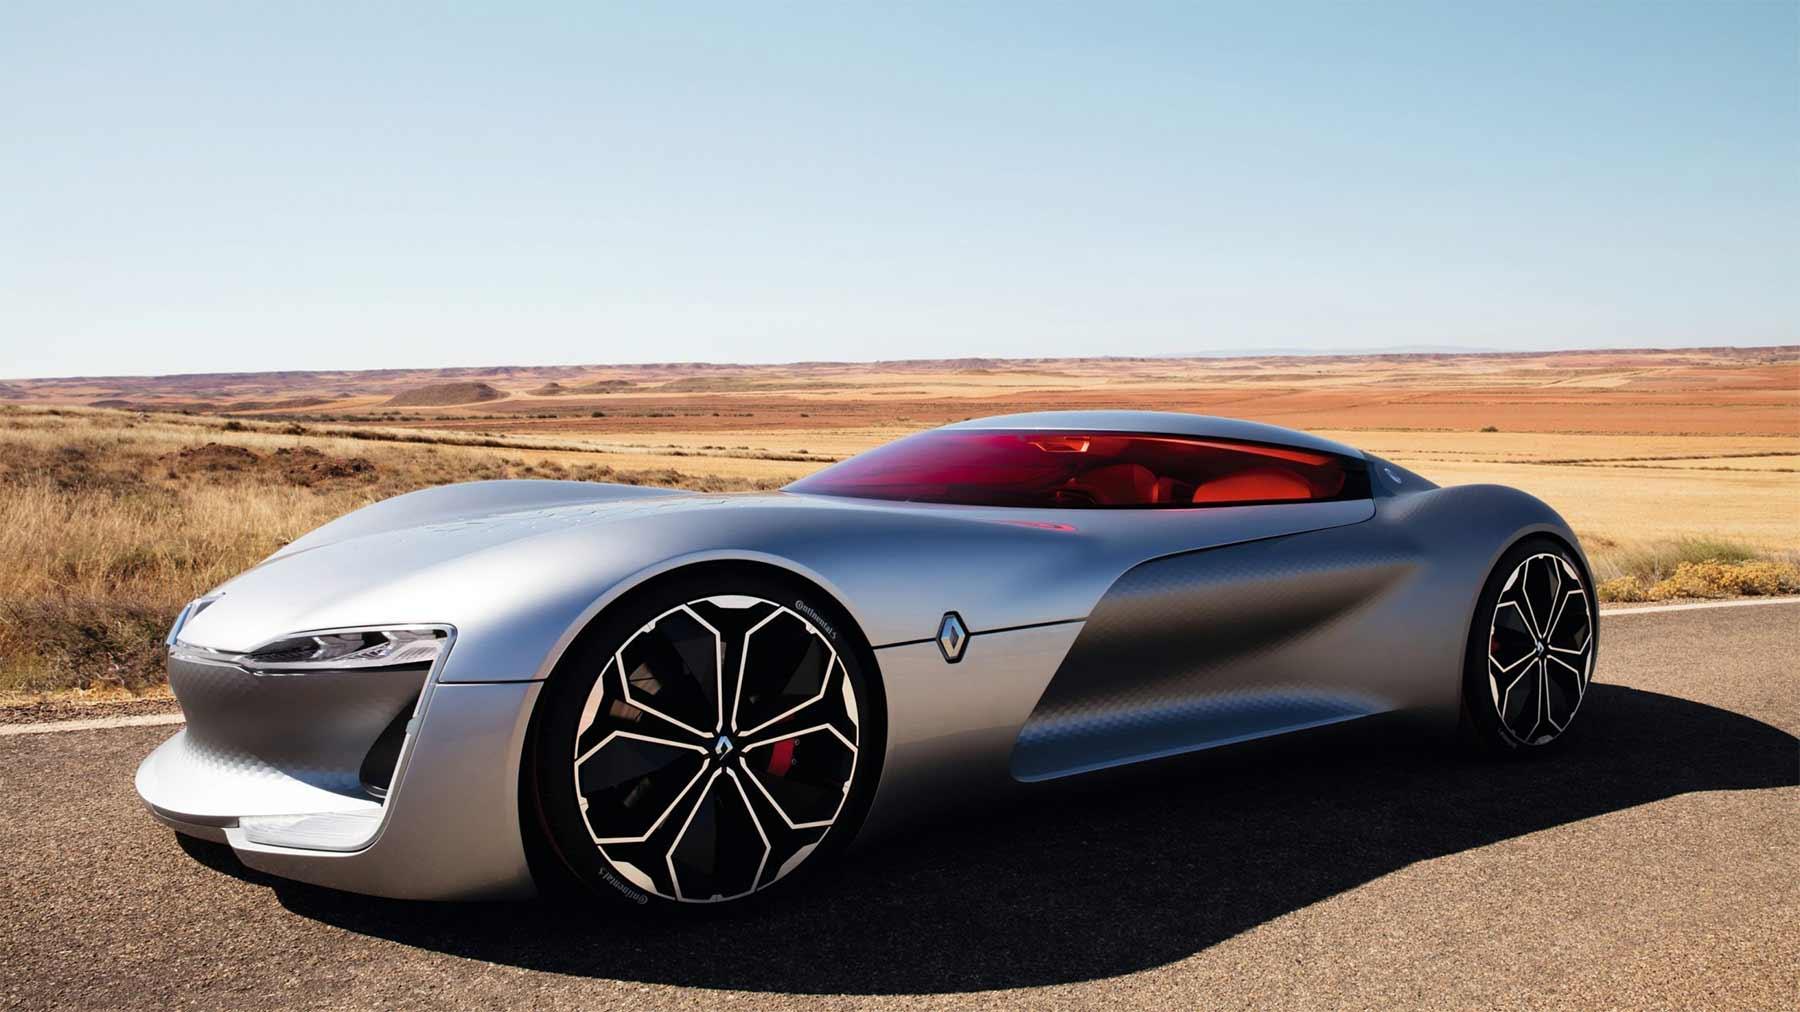 Renault Trezor GT Concept Car Renault-Trezor-GT-Concept-Car